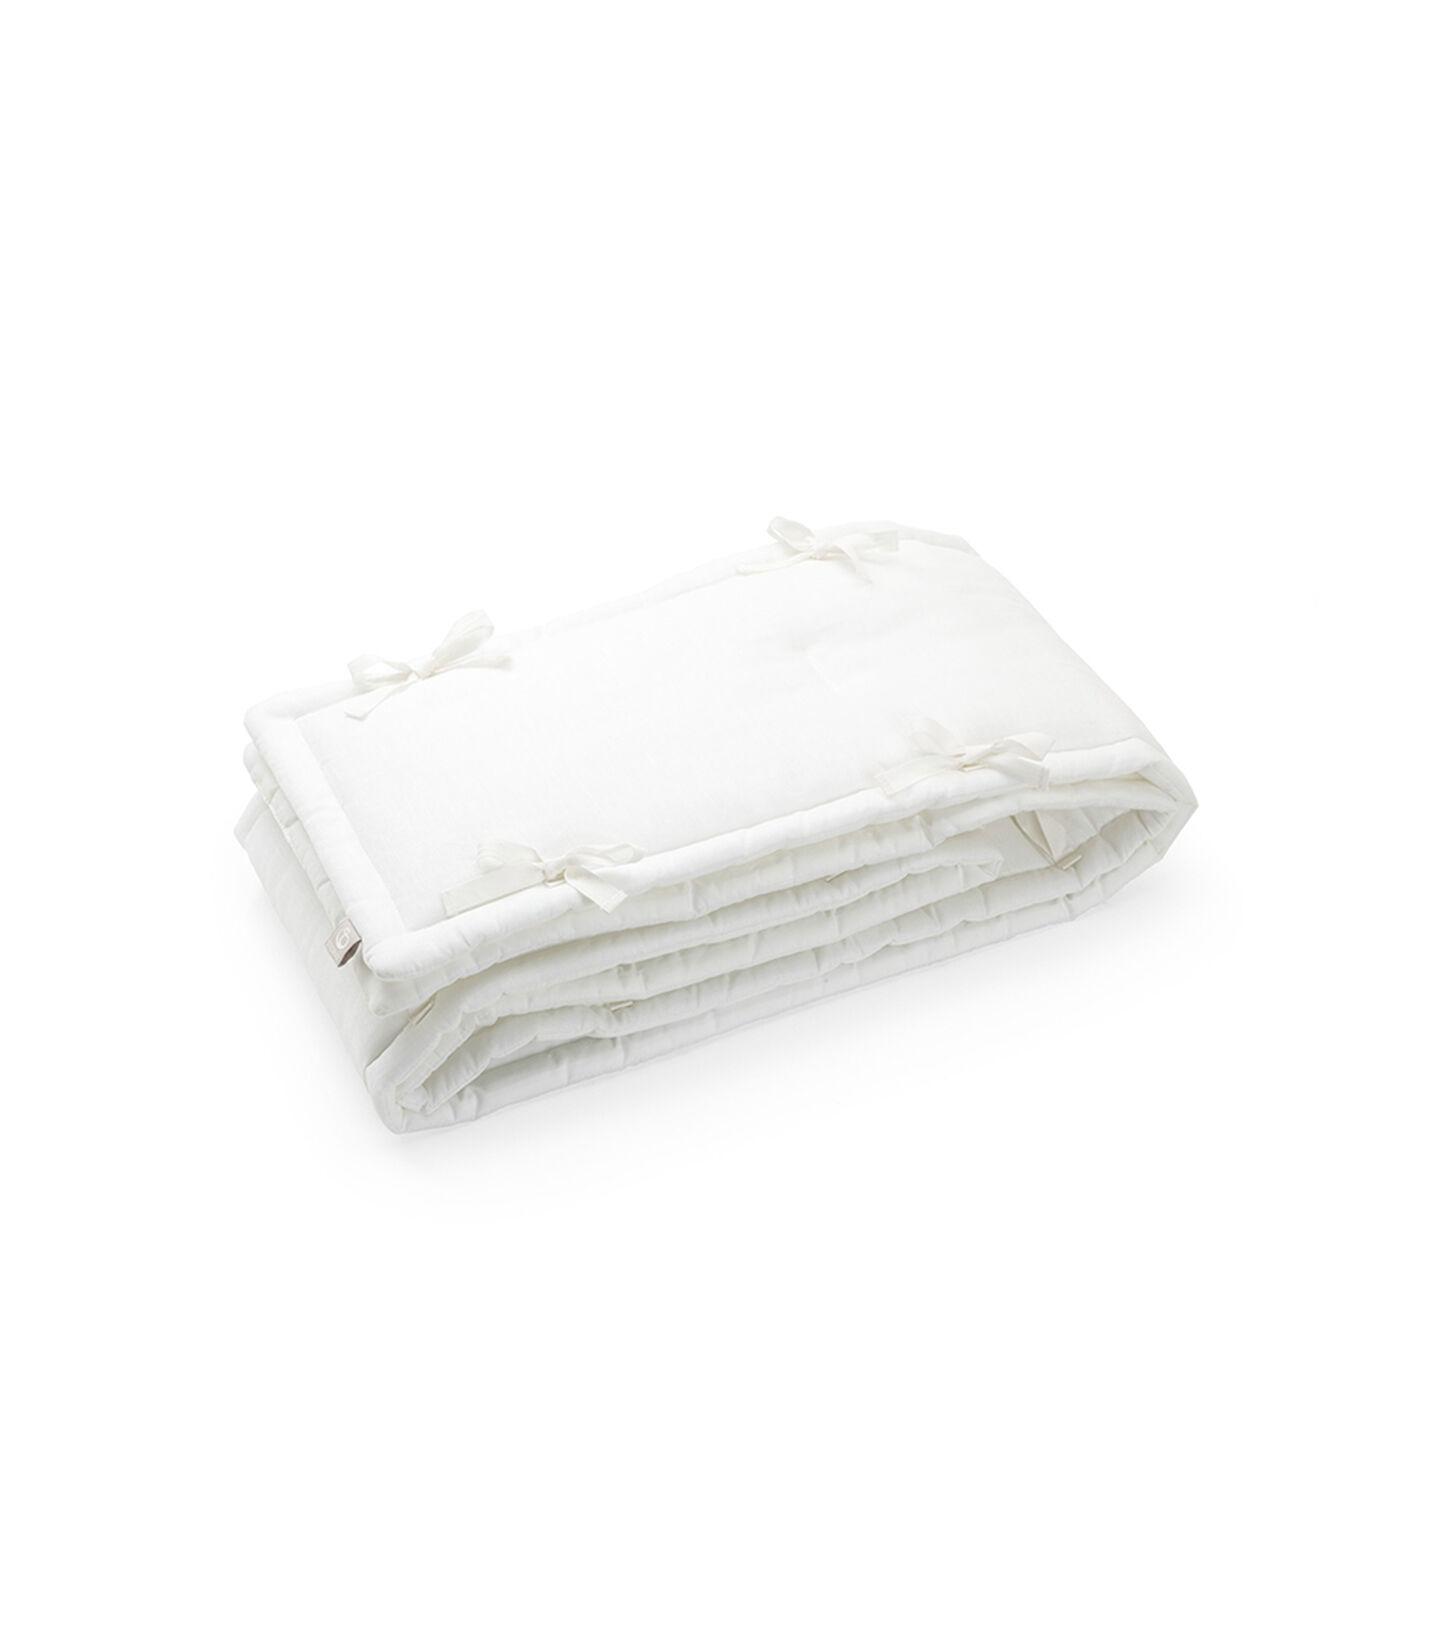 Stokke® Sleepi™ Bed Bumper, White. view 2